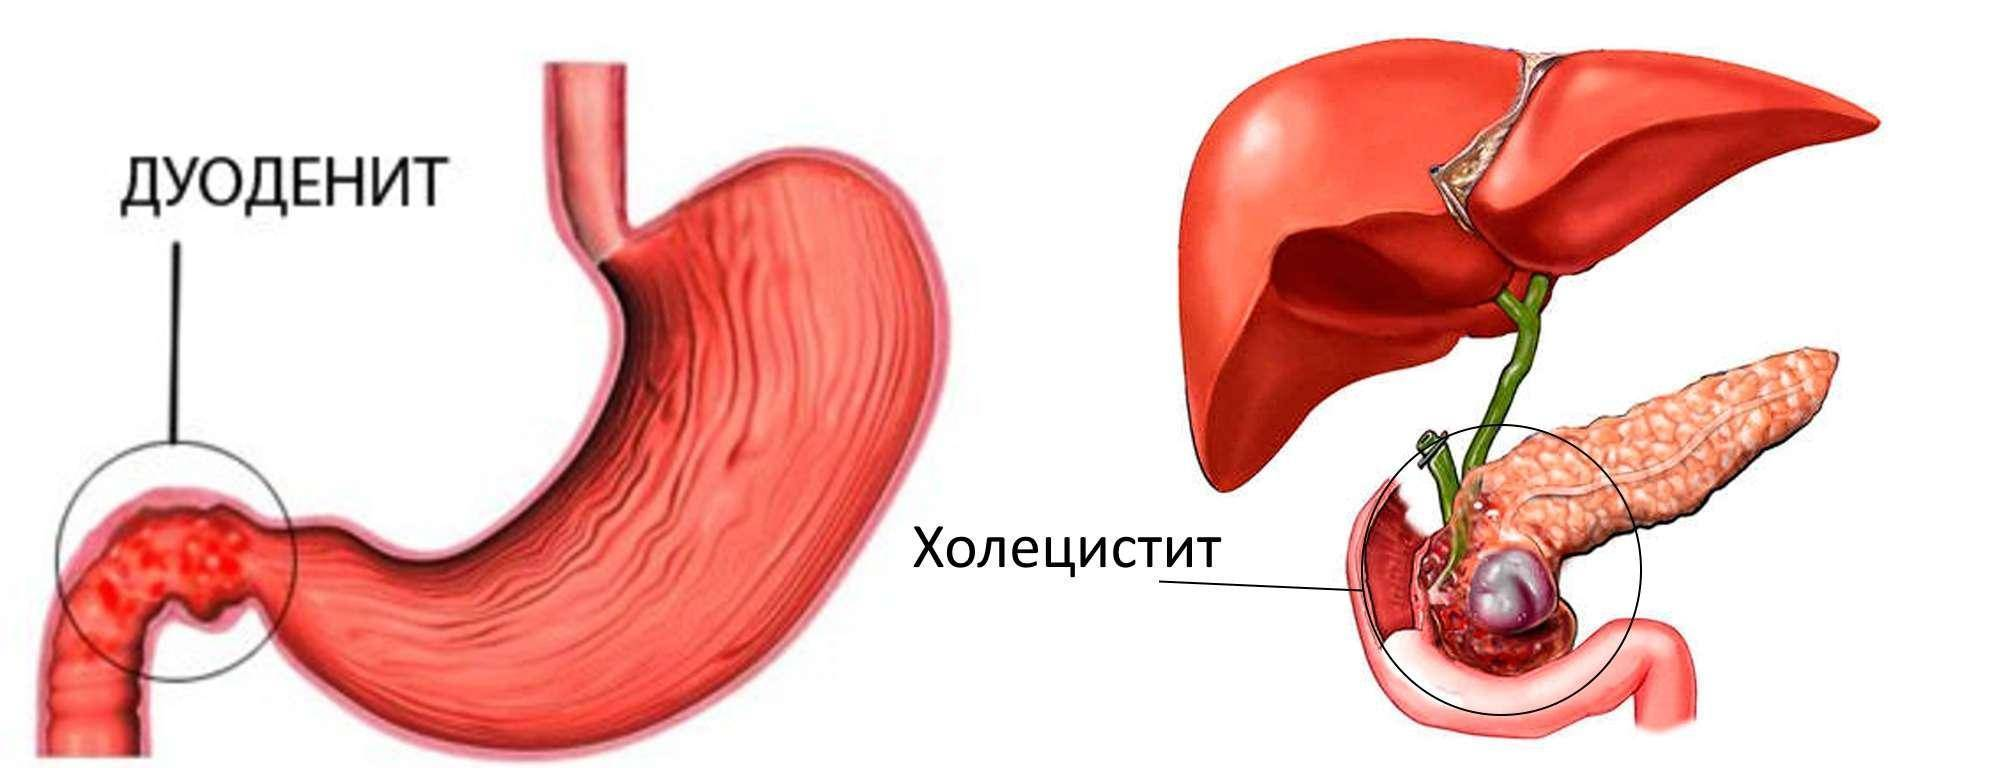 симптомы при холецистите и панкреатите